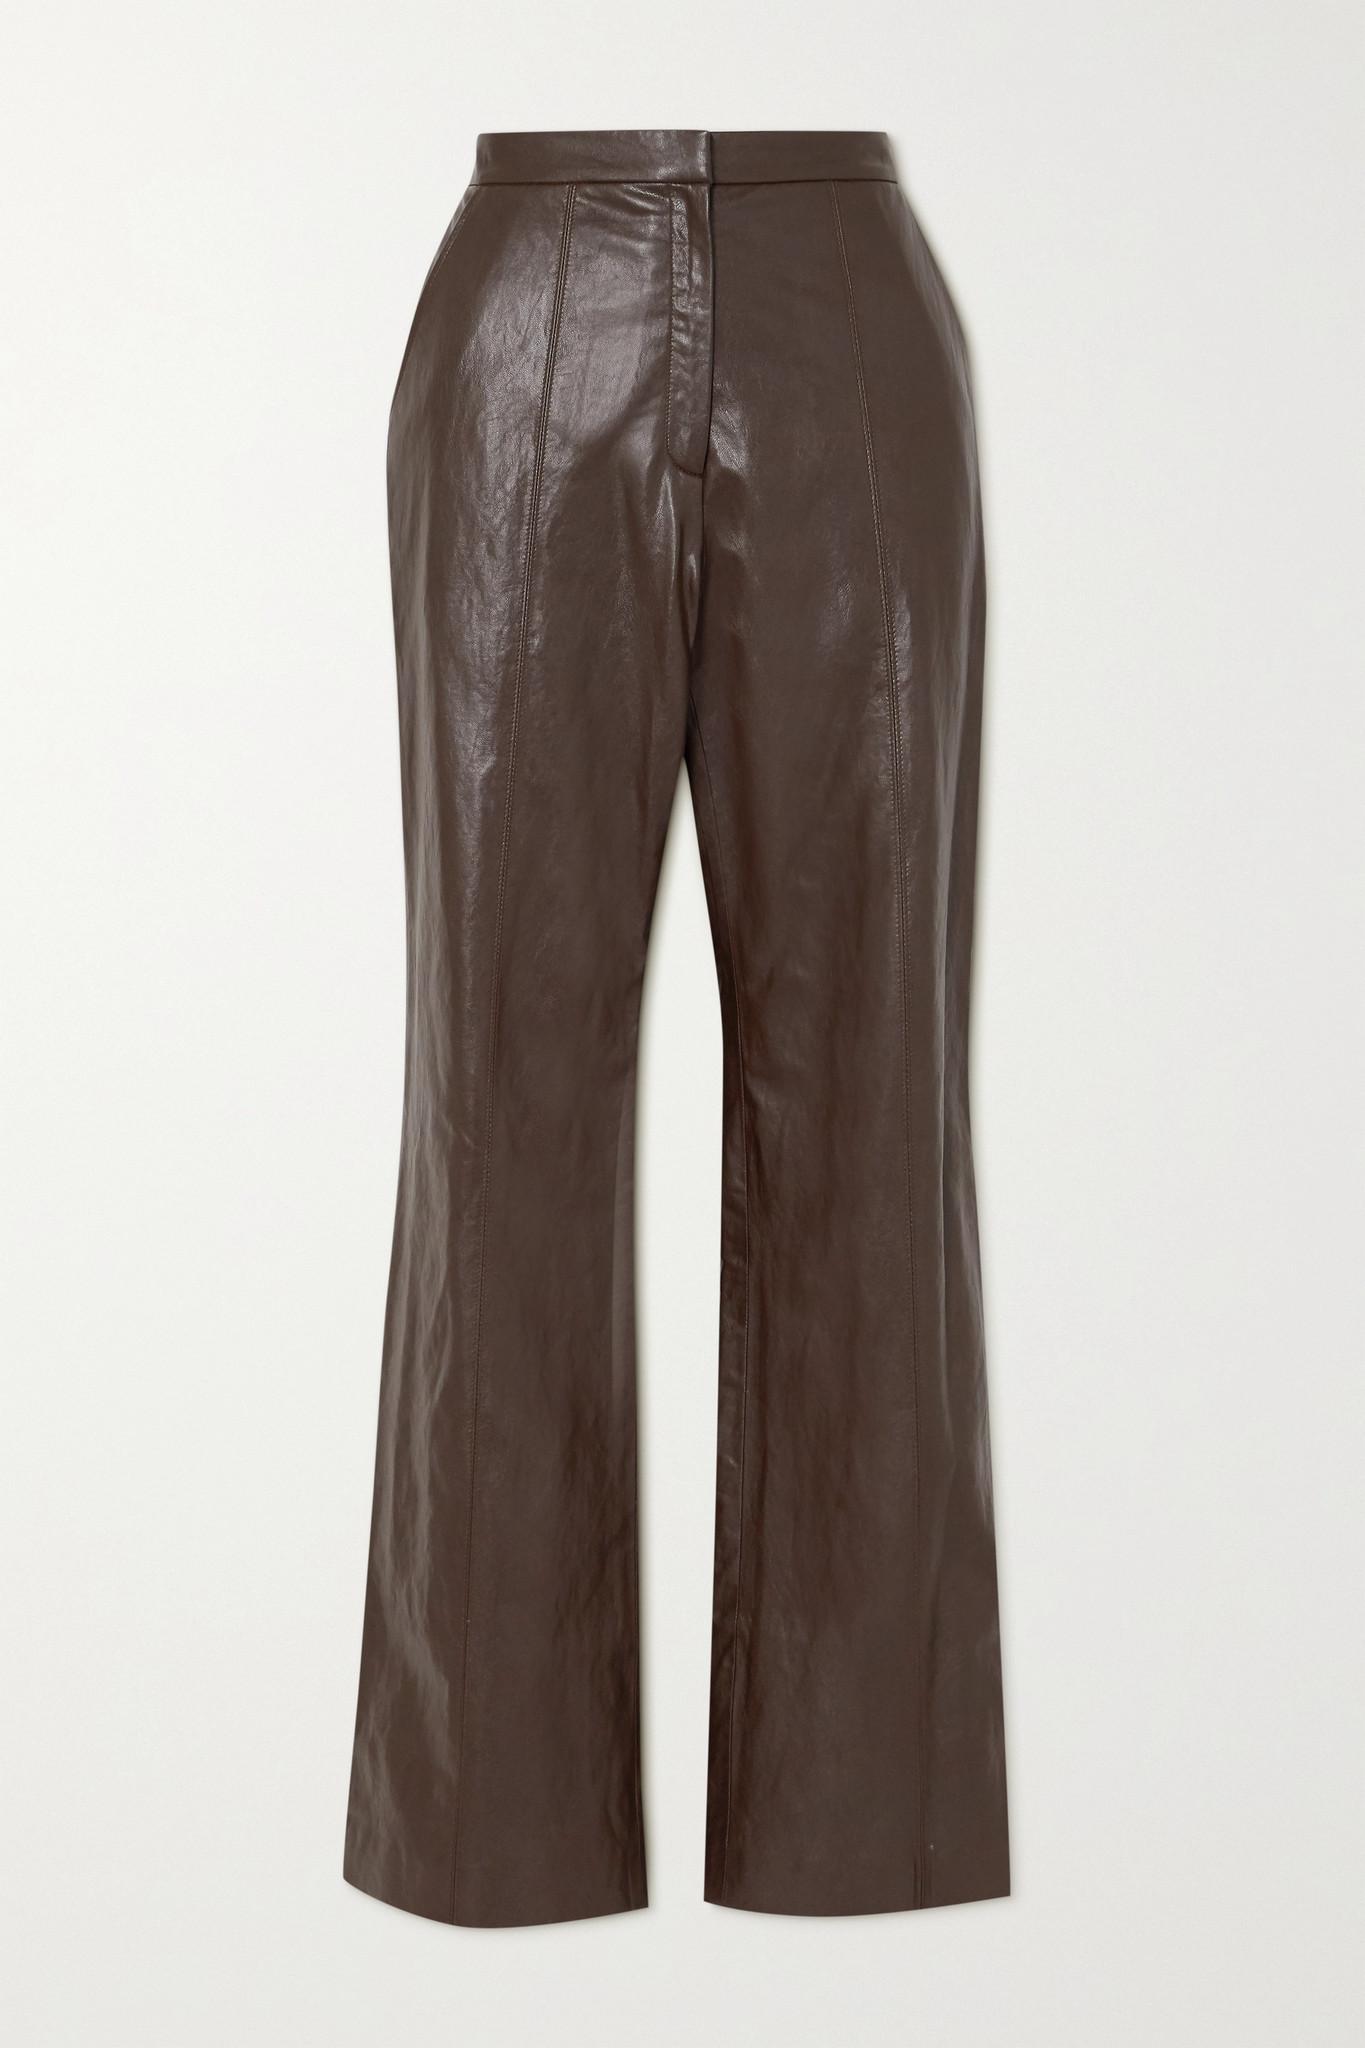 LVIR - 人造皮革直筒裤 - 棕色 - FR40